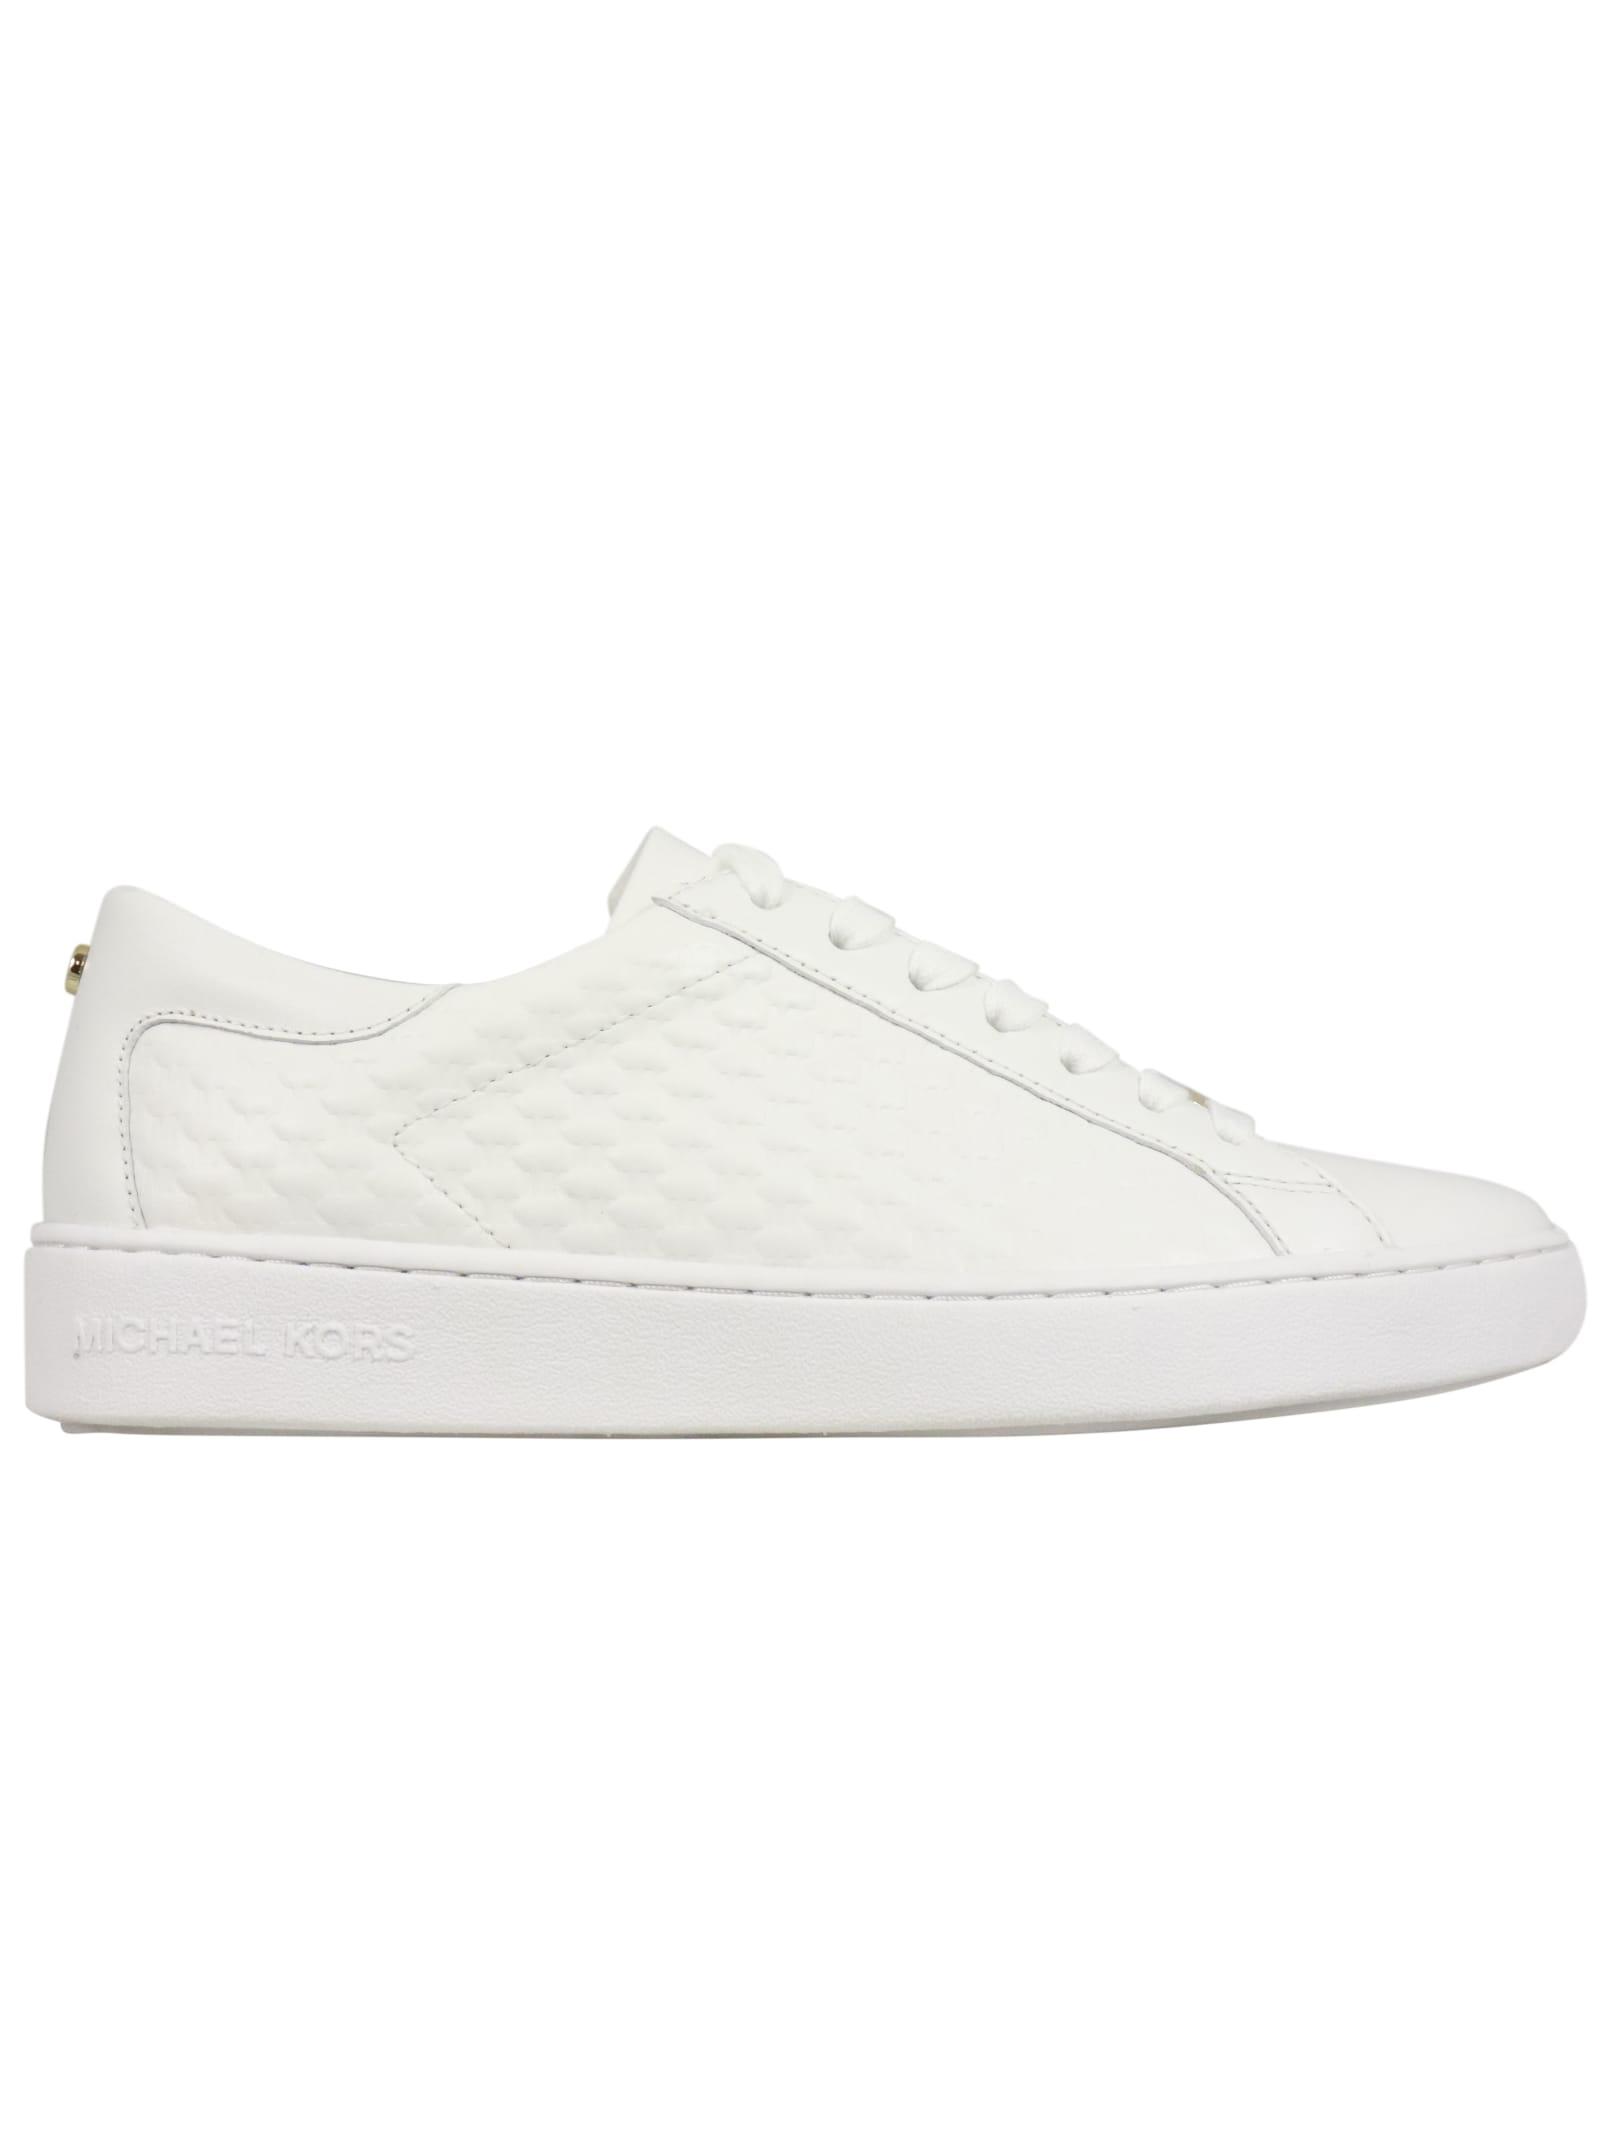 Michael Kors Colby Sneaker Sneaker